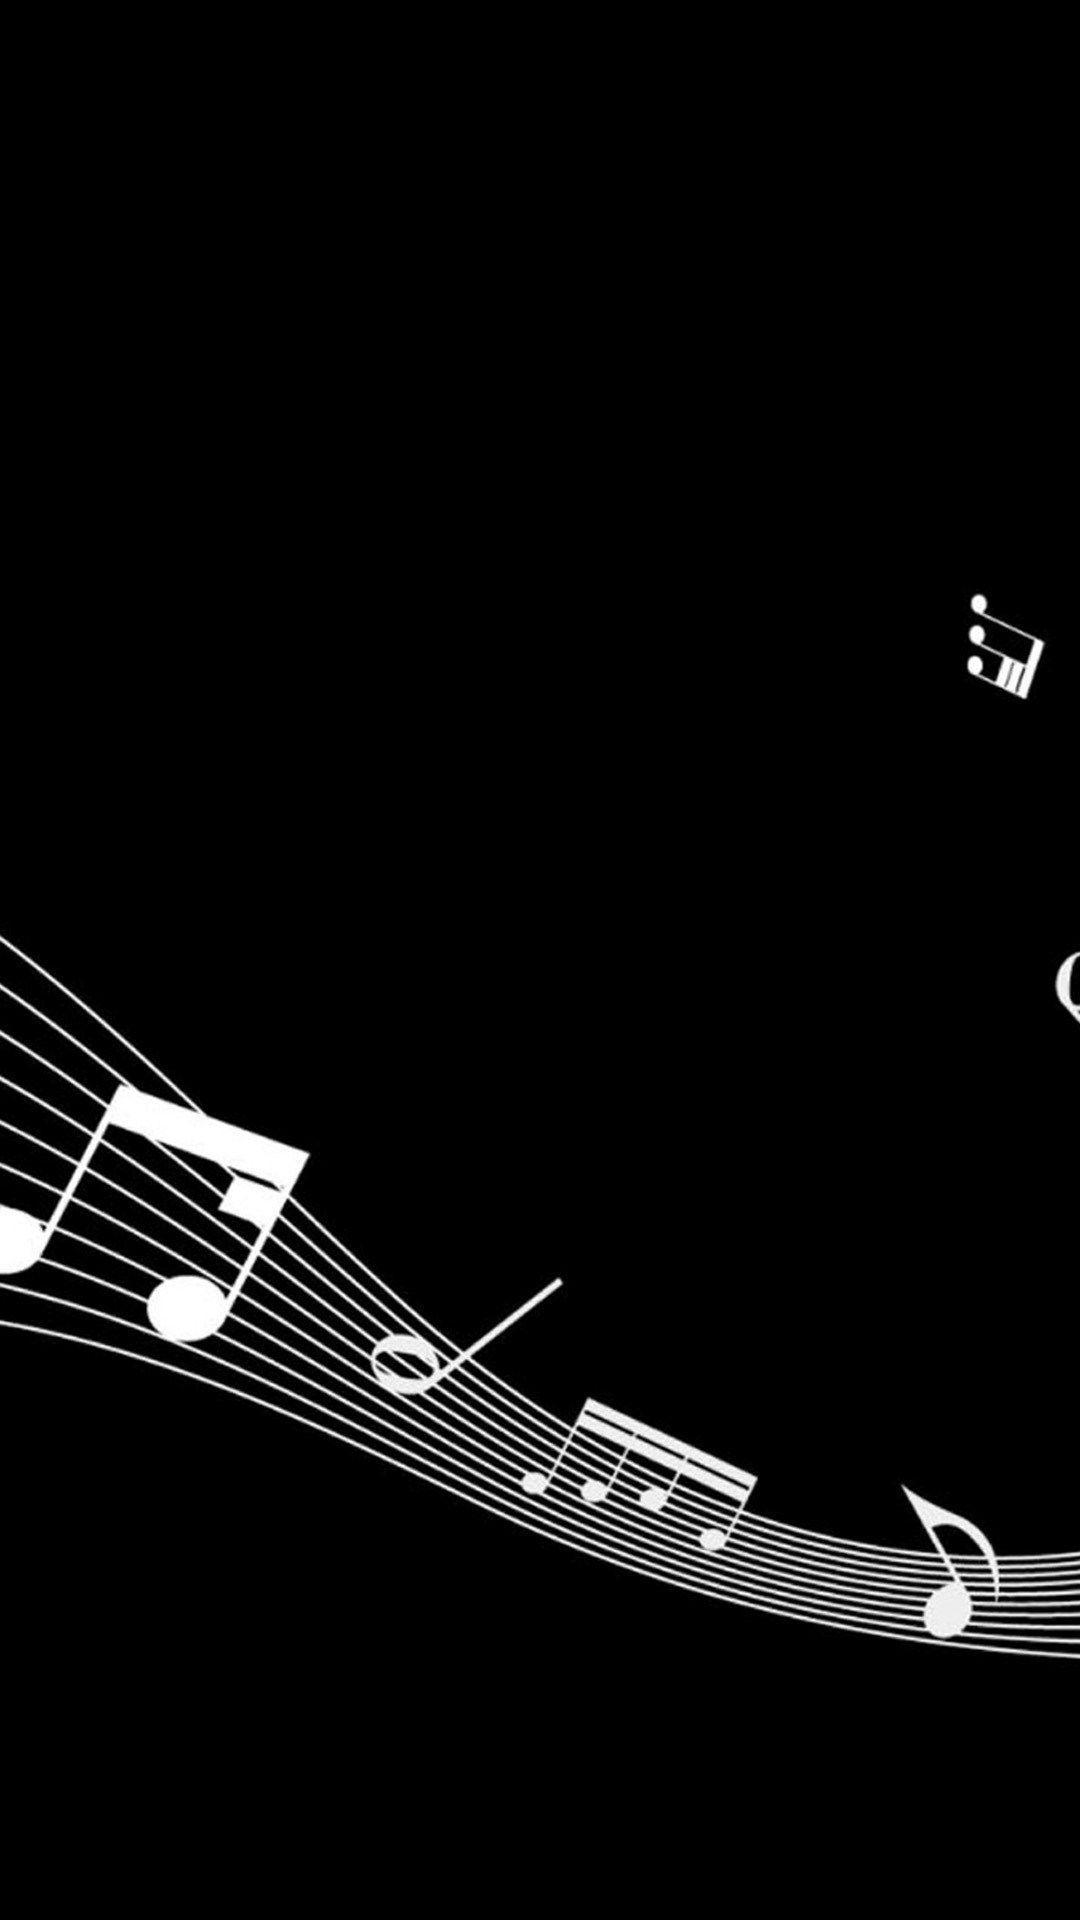 Dark Music Wallpapers Top Free Dark Music Backgrounds Wallpaperaccess